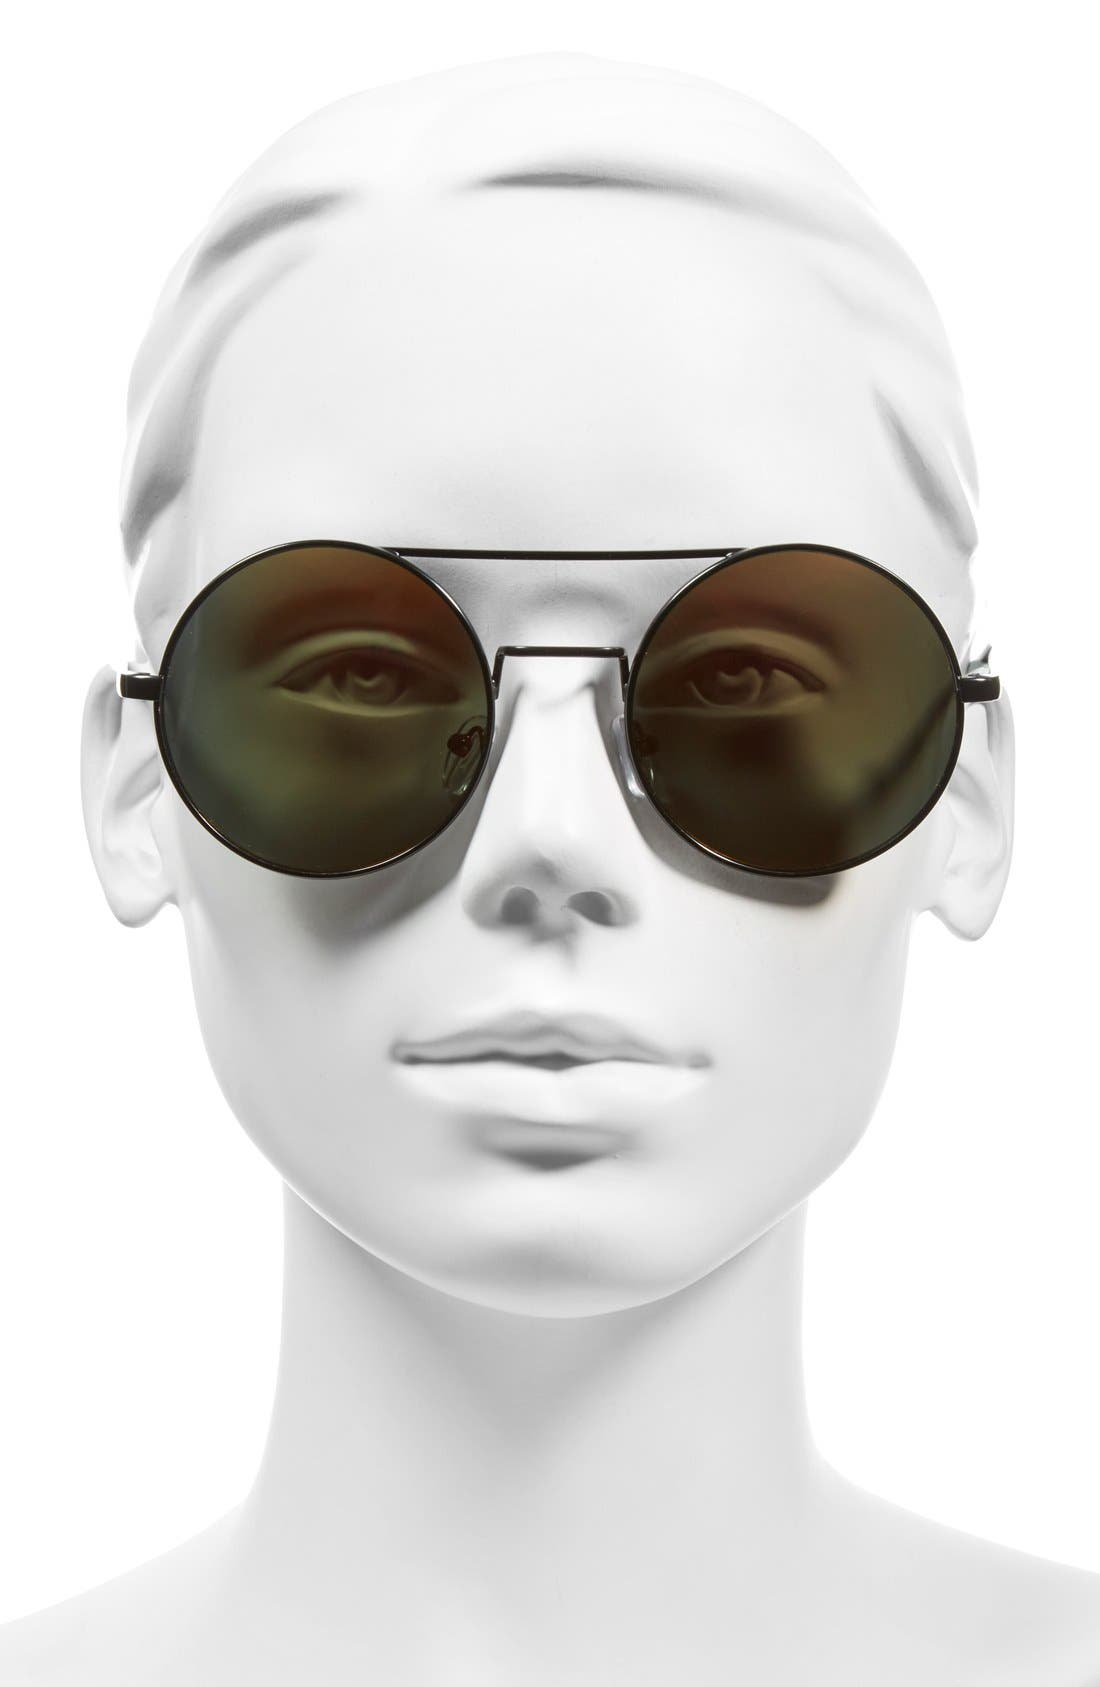 A.J. MORGAN, 'Eclipse' 54mm Round Mirror Lens Sunglasses, Alternate thumbnail 2, color, 001